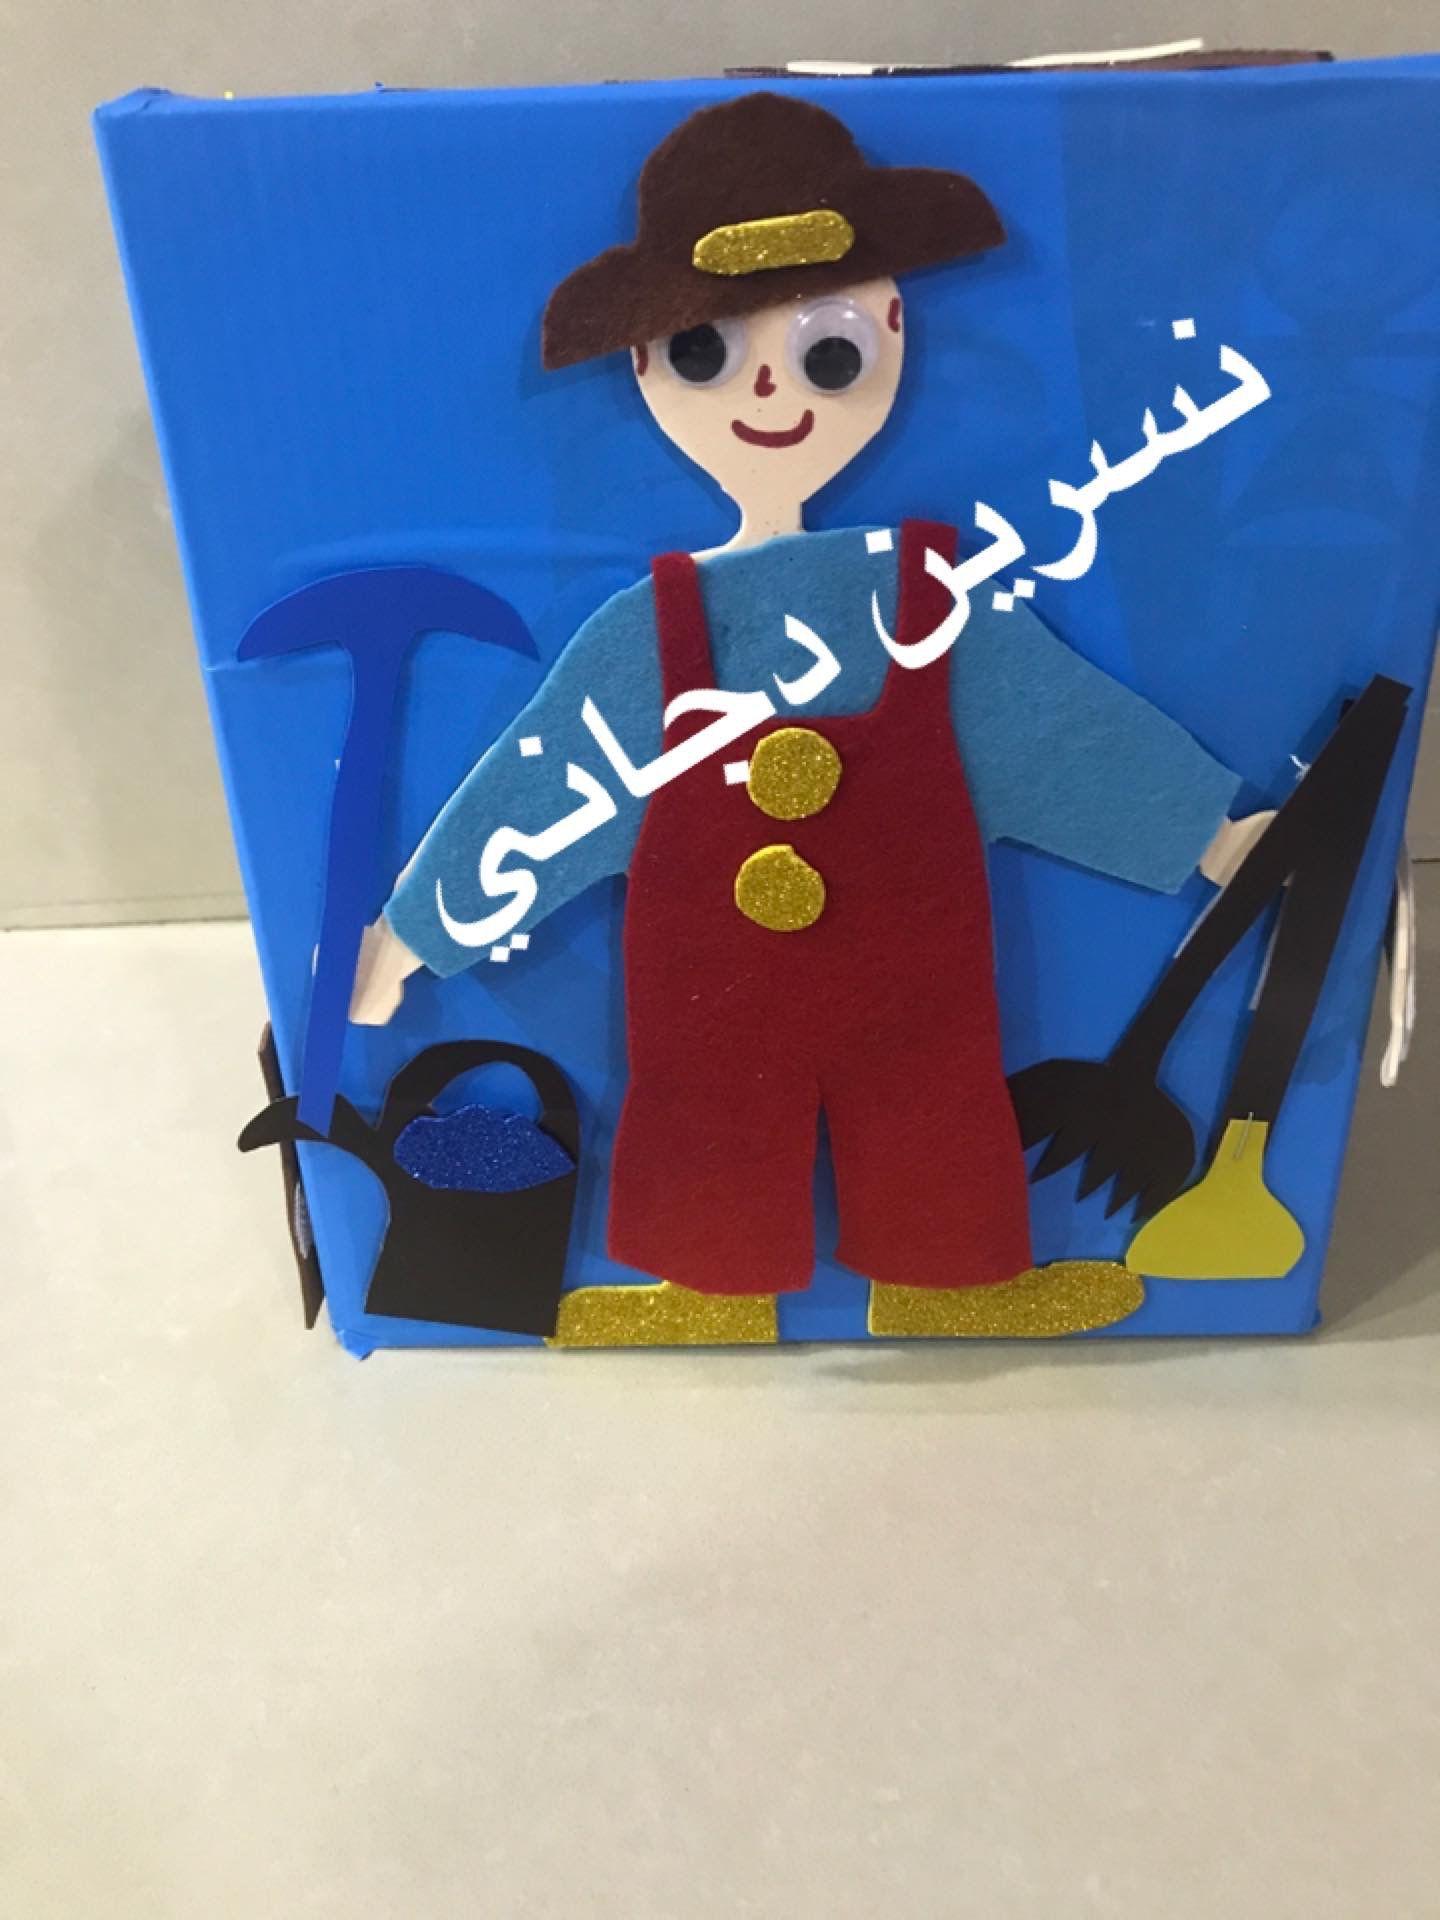 Pin By Teacher Nisreen Ahmad Dajani On Farmer قصة الفلاح و سنبلة القمح Character Ronald Mcdonald Fictional Characters